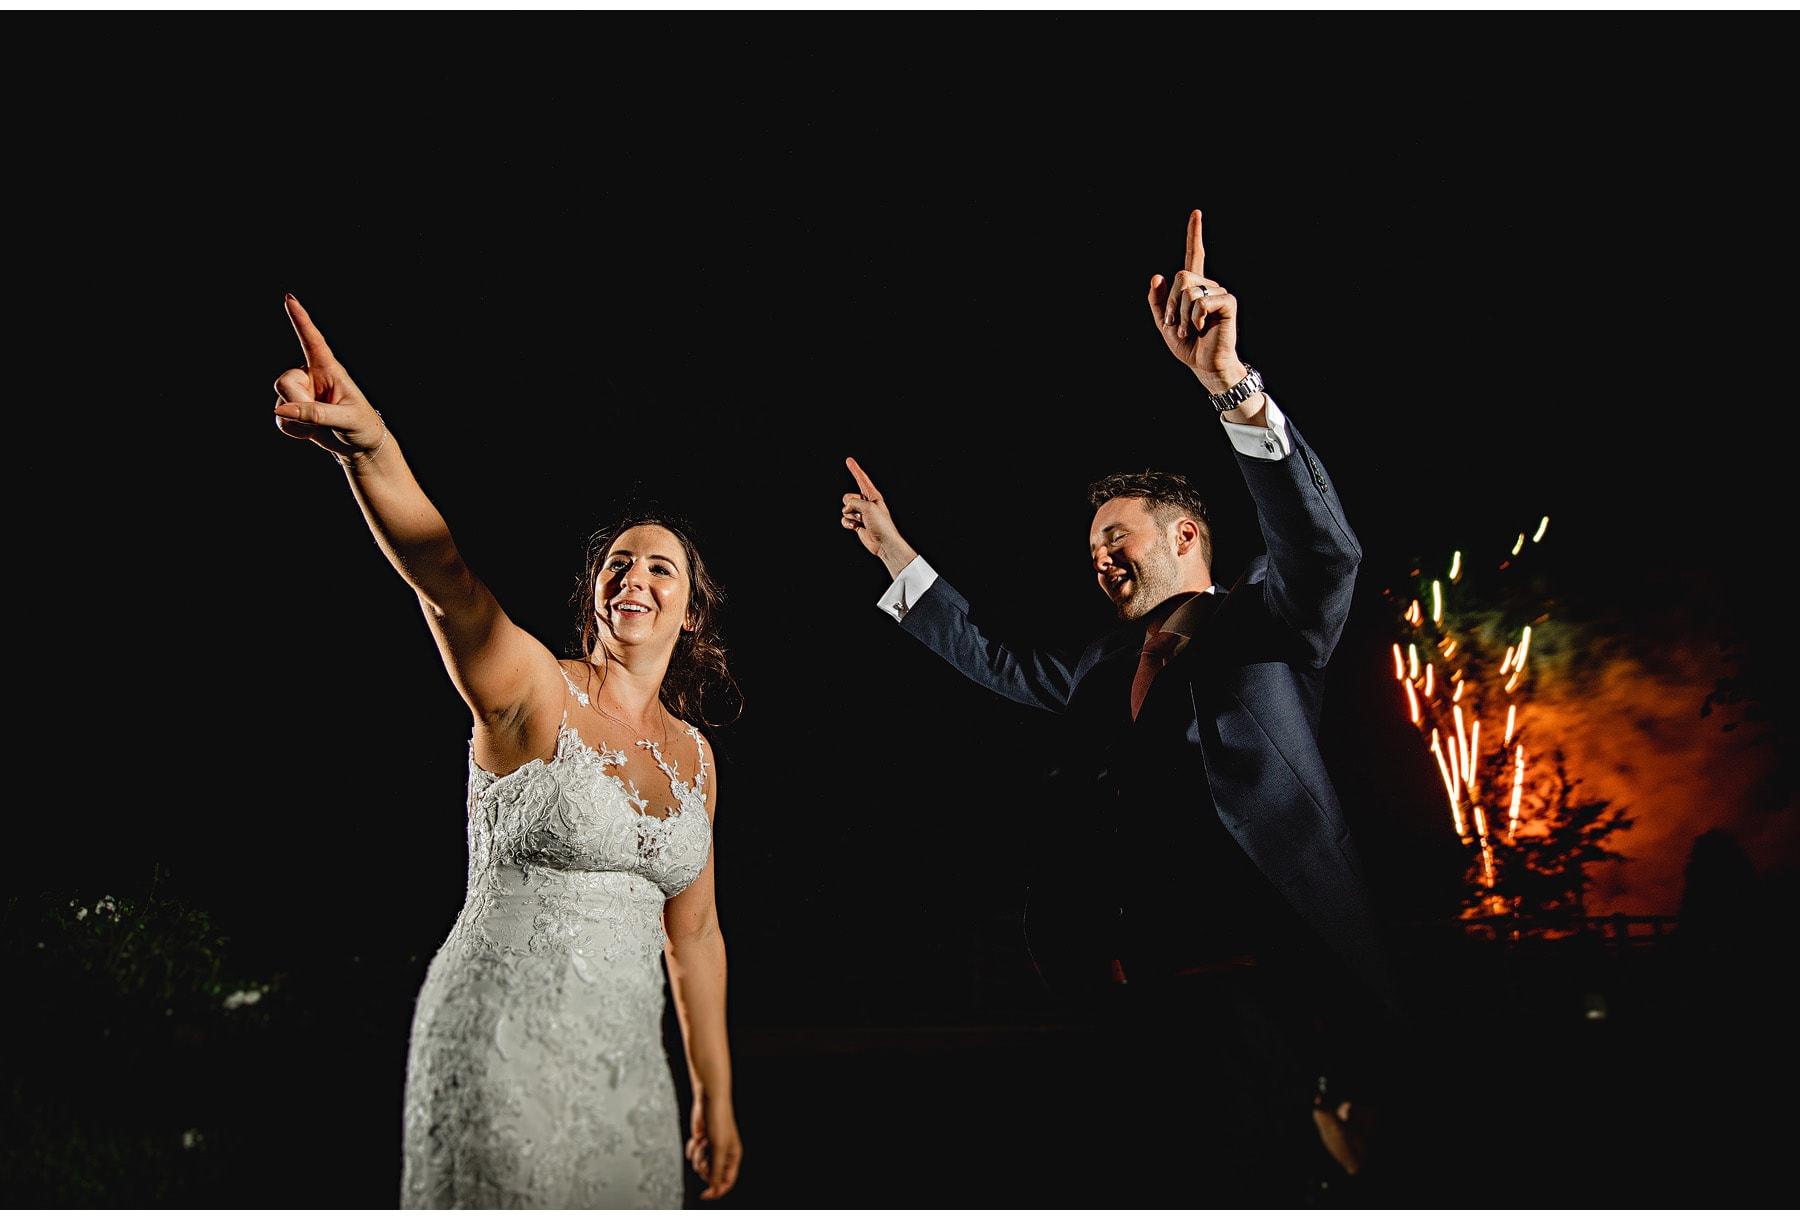 the bride & groom dancing